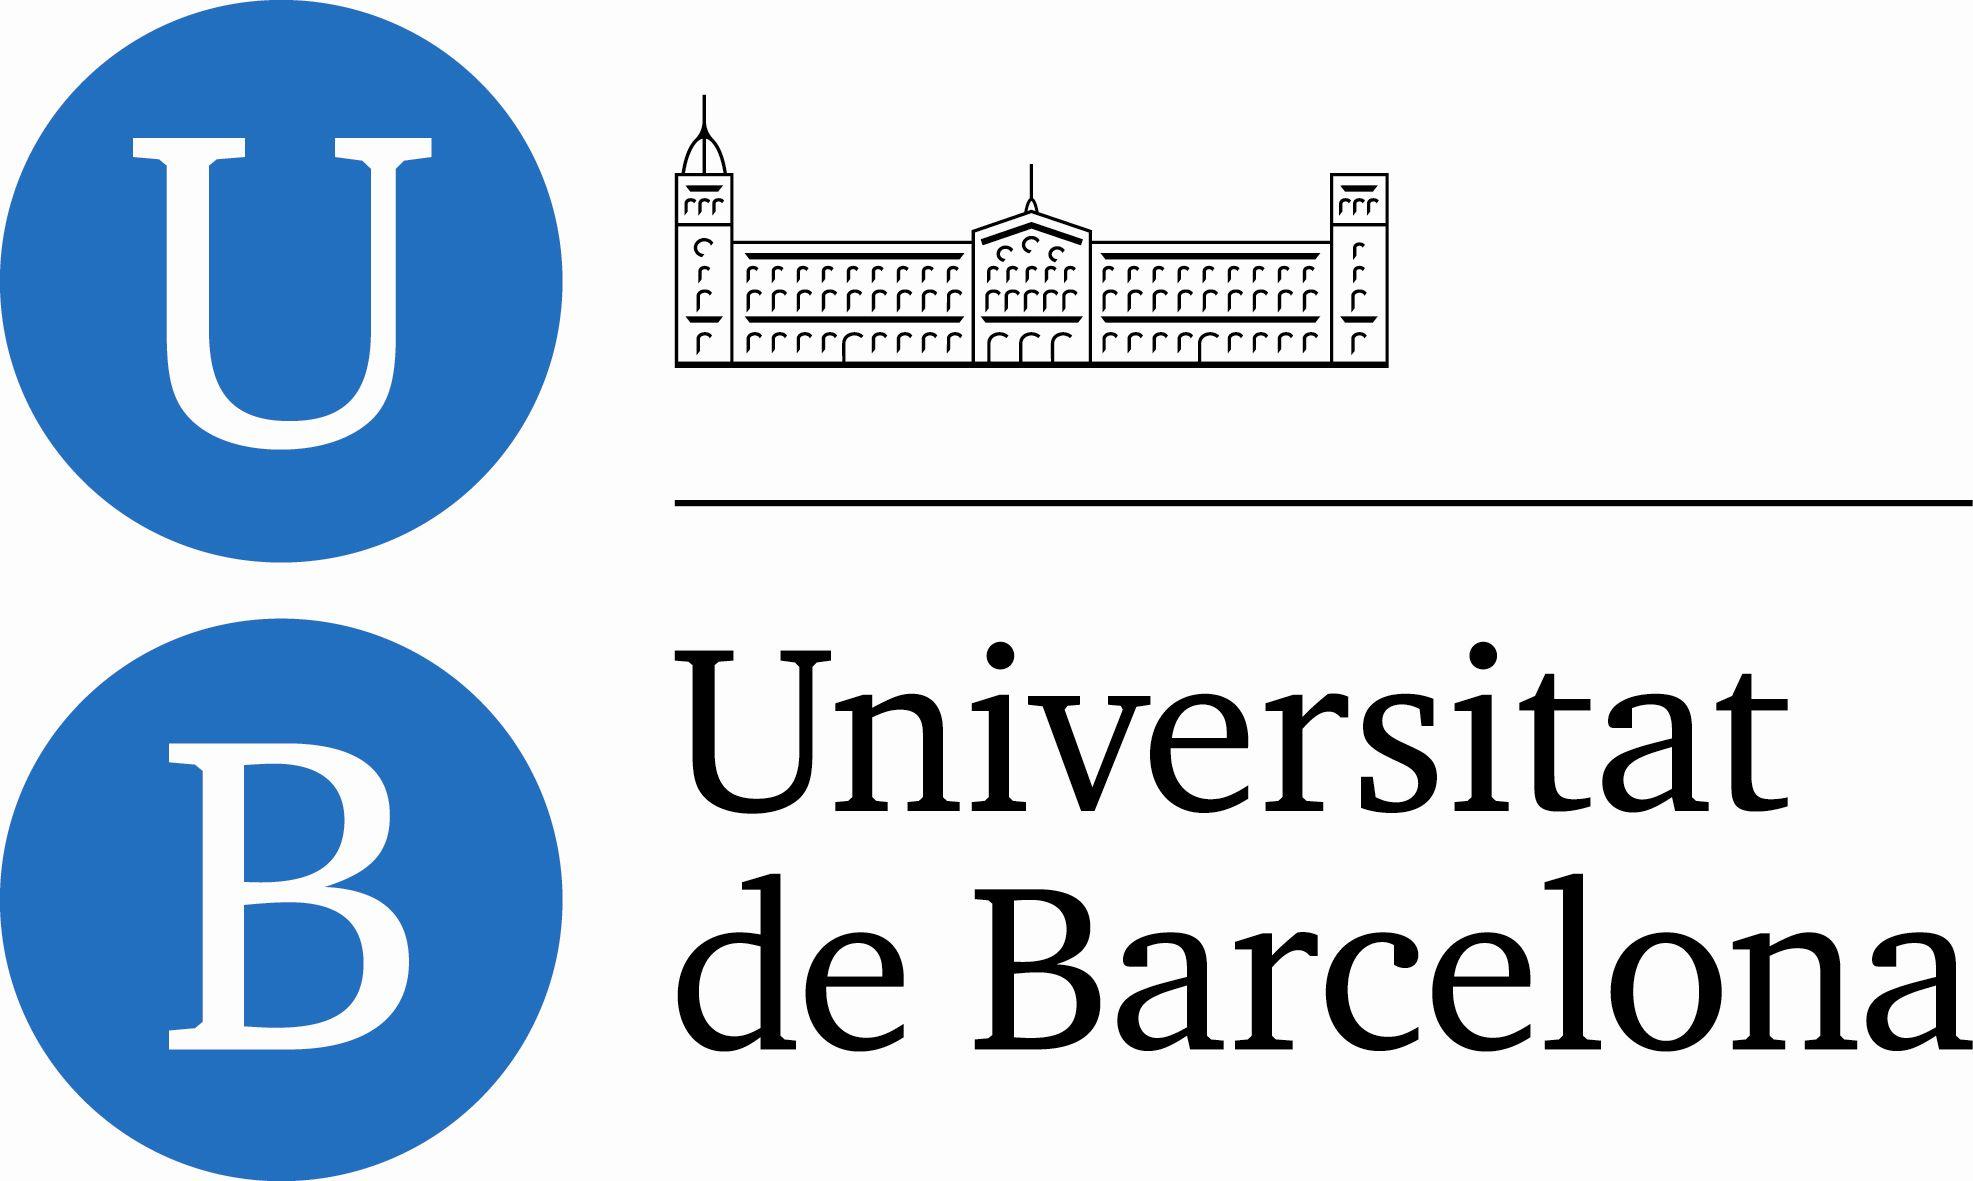 3ª Generación de Mindfulness, UB universitat de barcelona